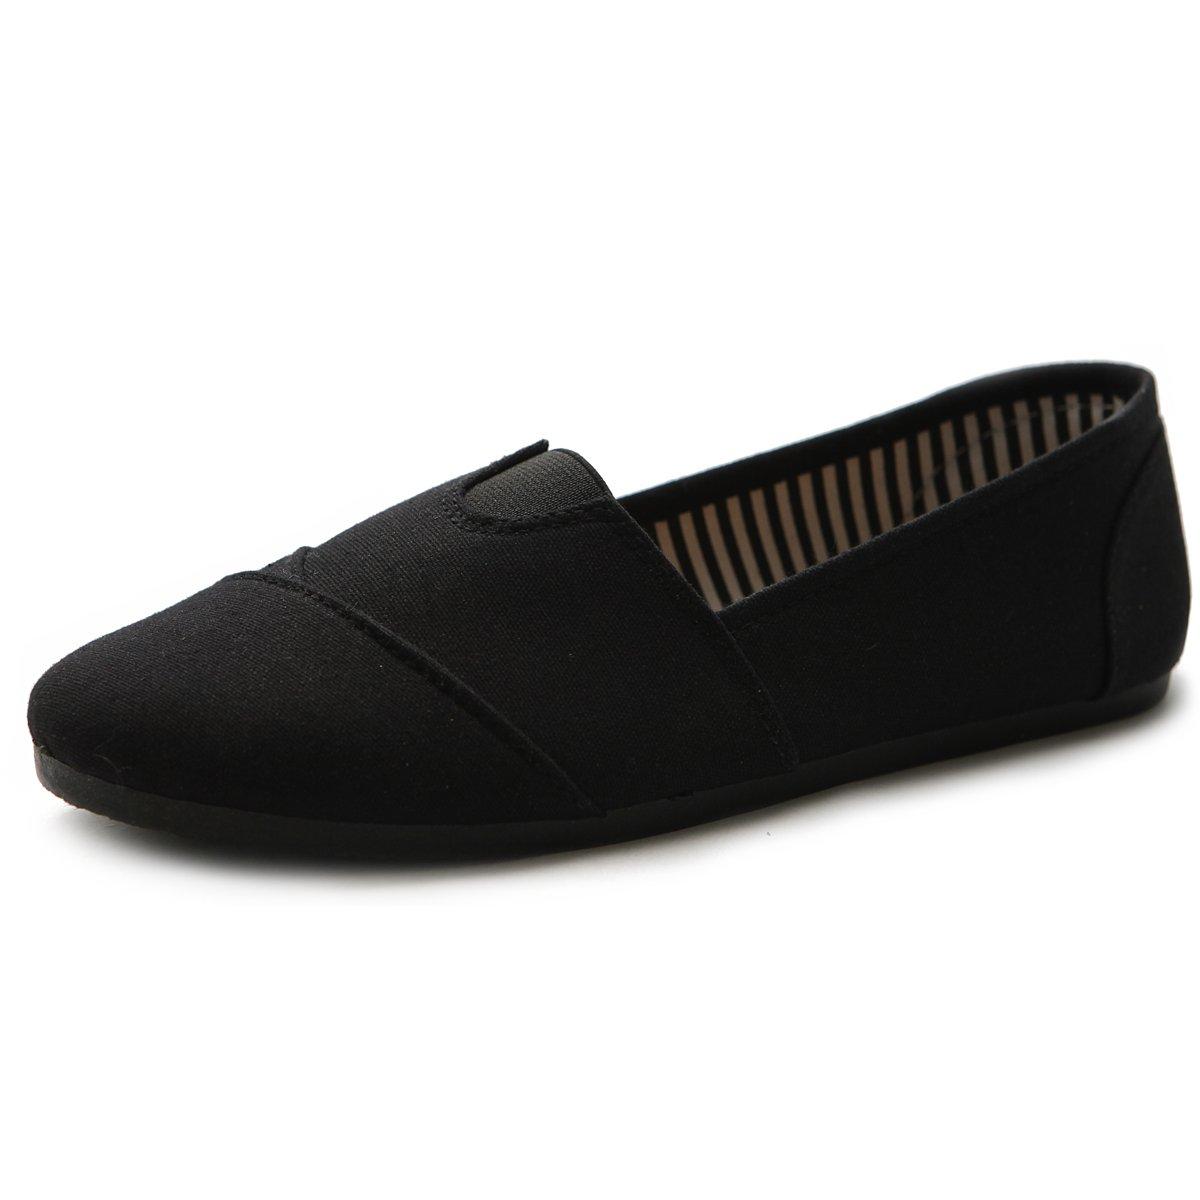 Ollio Womens Shoe Slip on Sneakers Canvas Flats L031(7.5 B(M) US, Black)